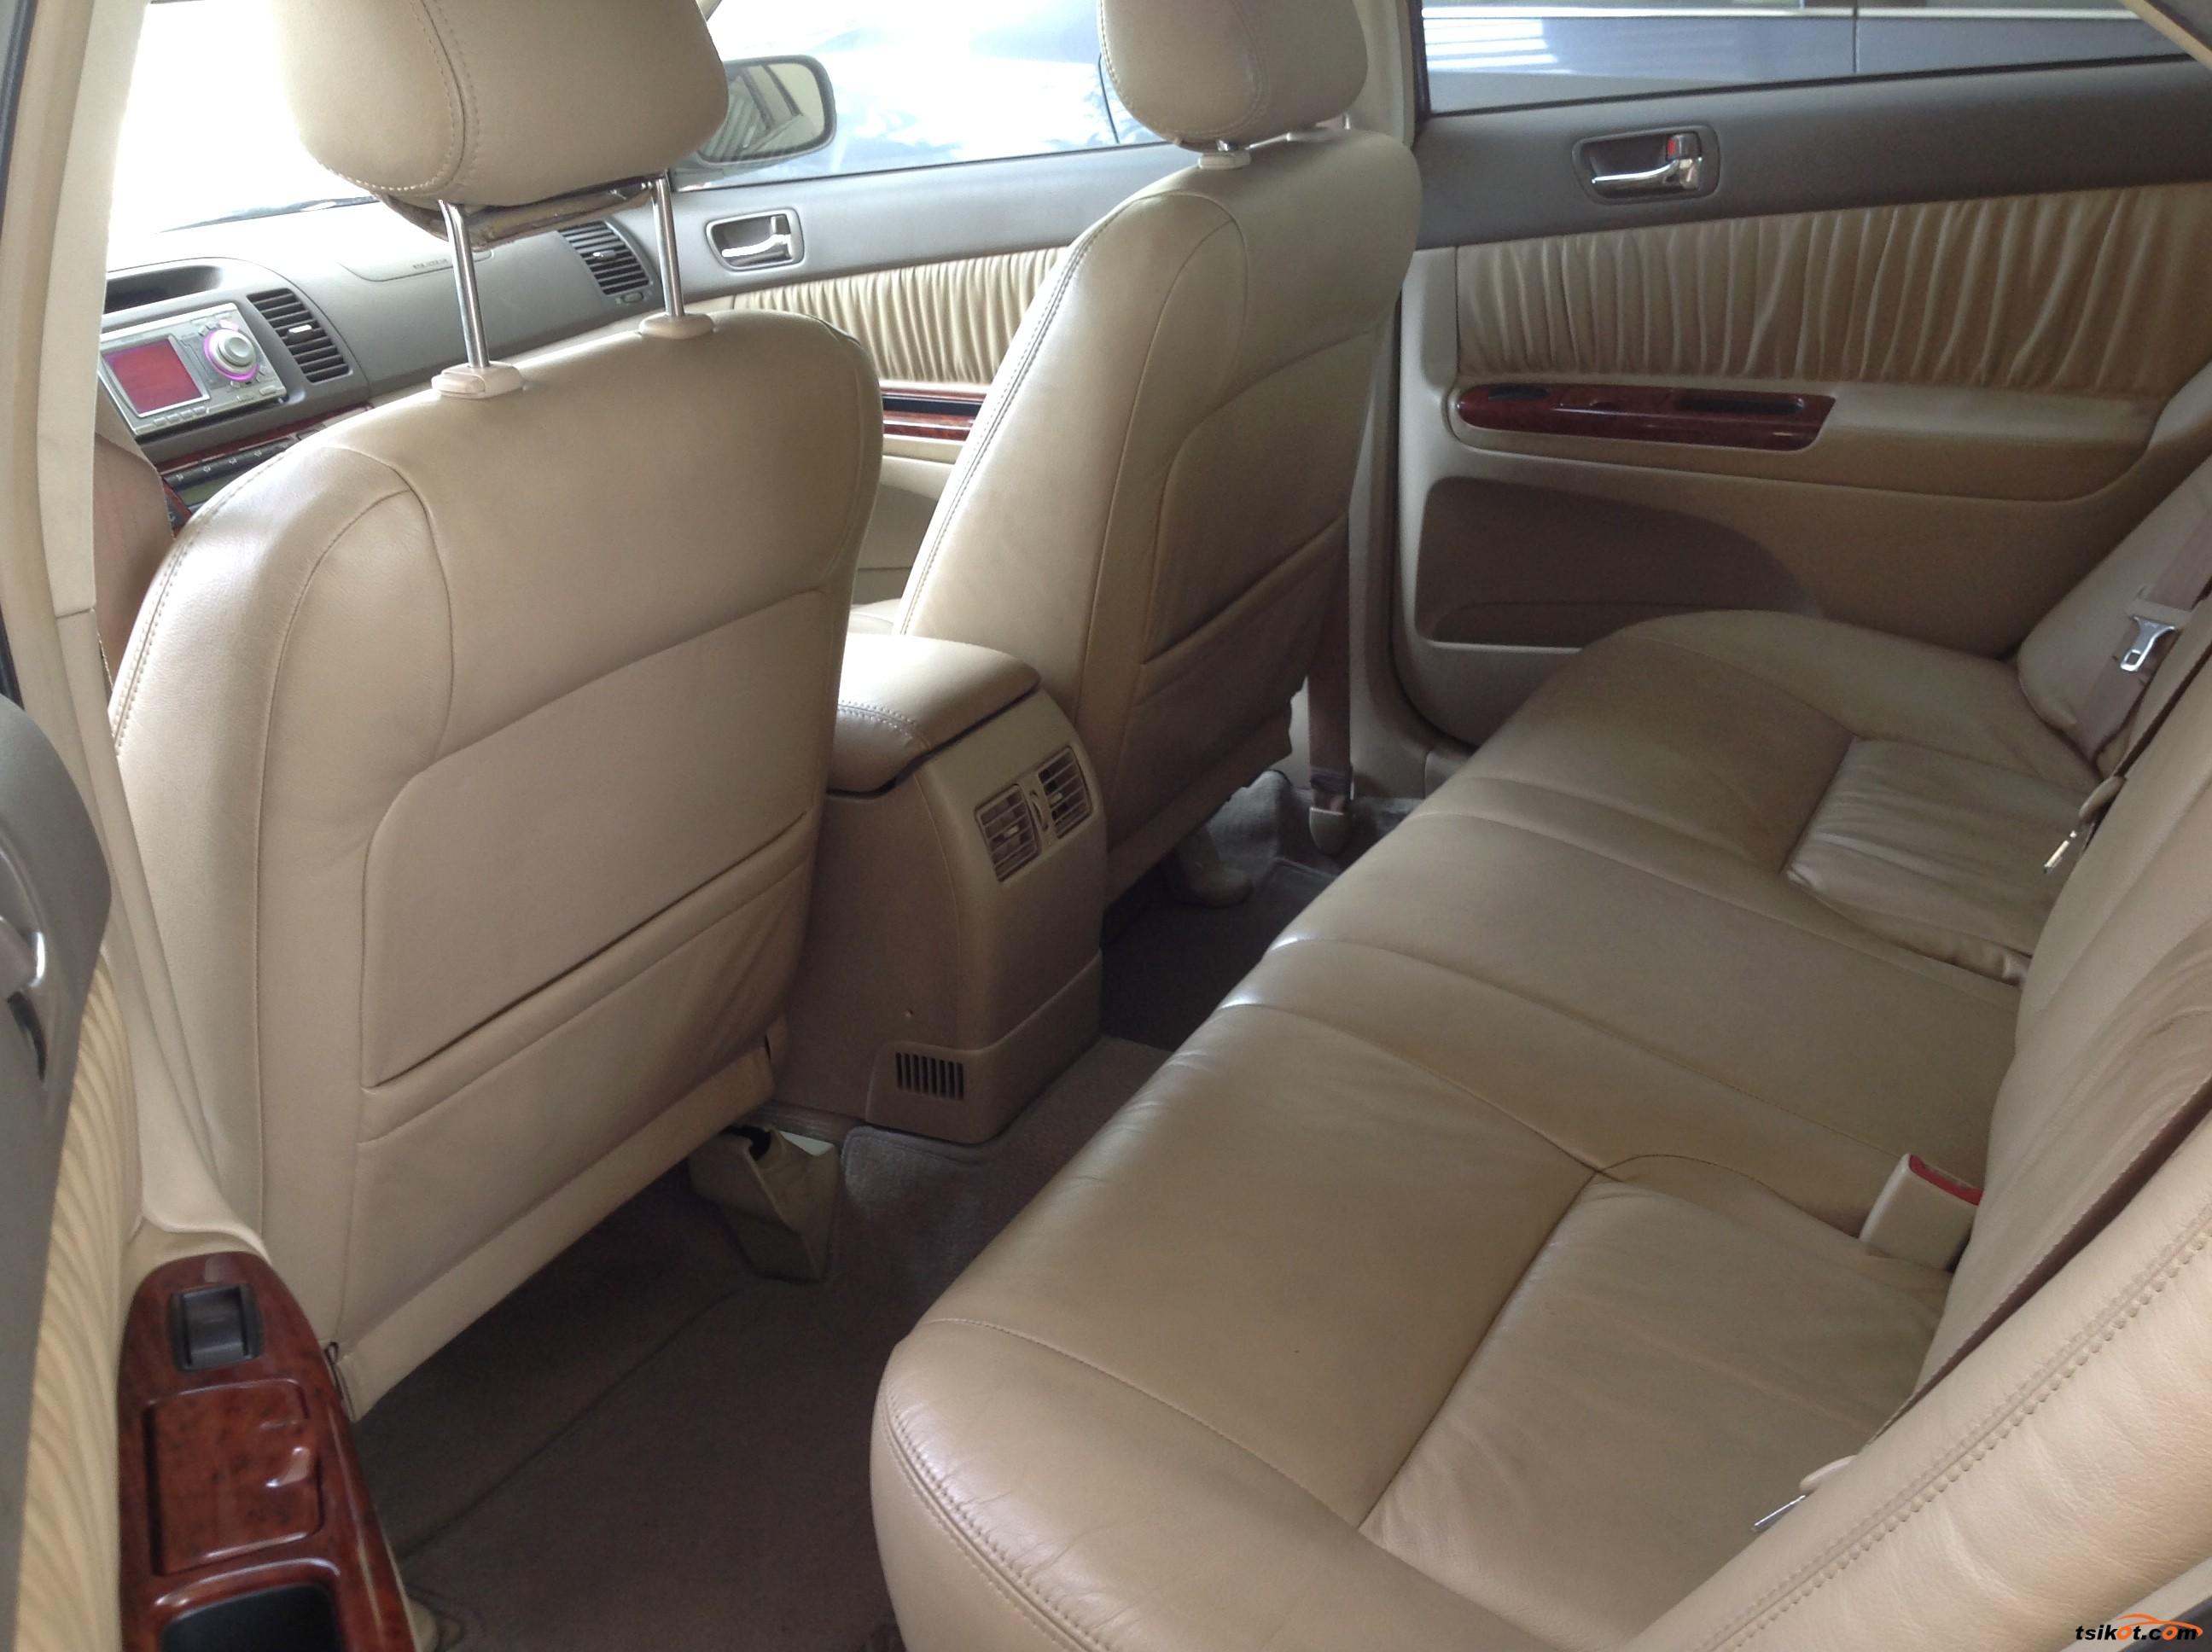 Toyota Camry 2003 - 2